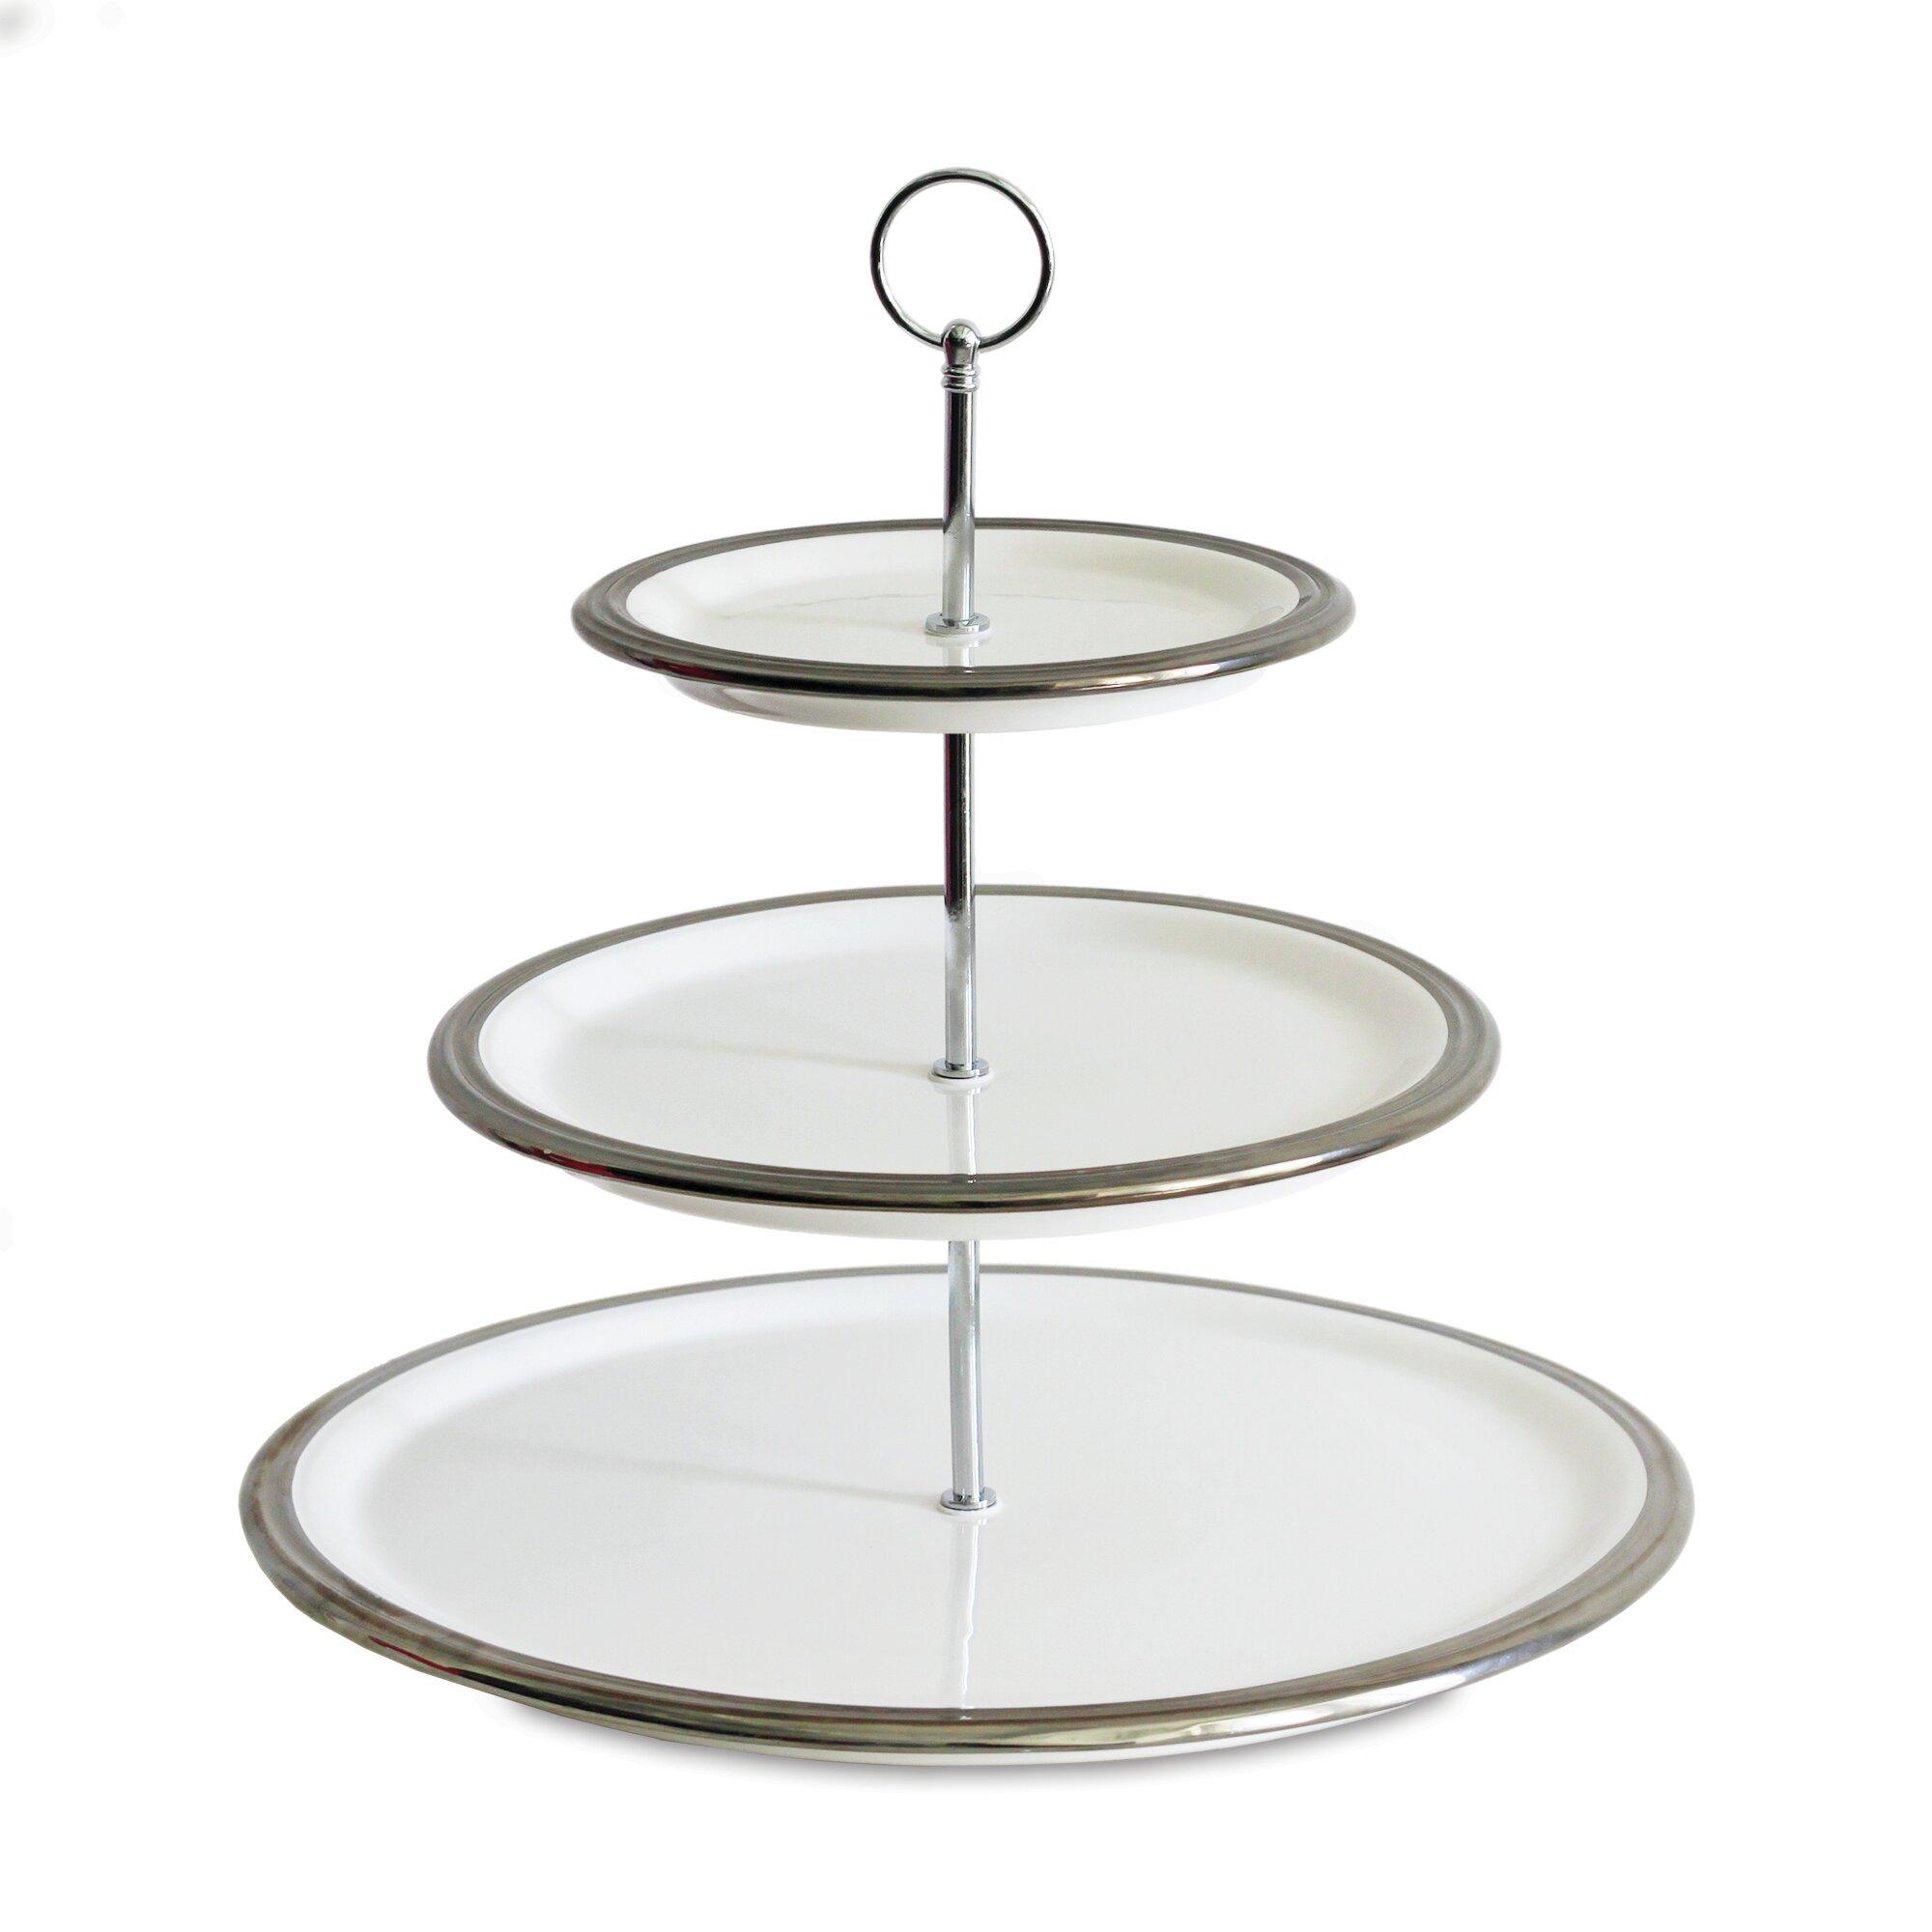 baum 3 tier server tiered stand reviews wayfair. Black Bedroom Furniture Sets. Home Design Ideas